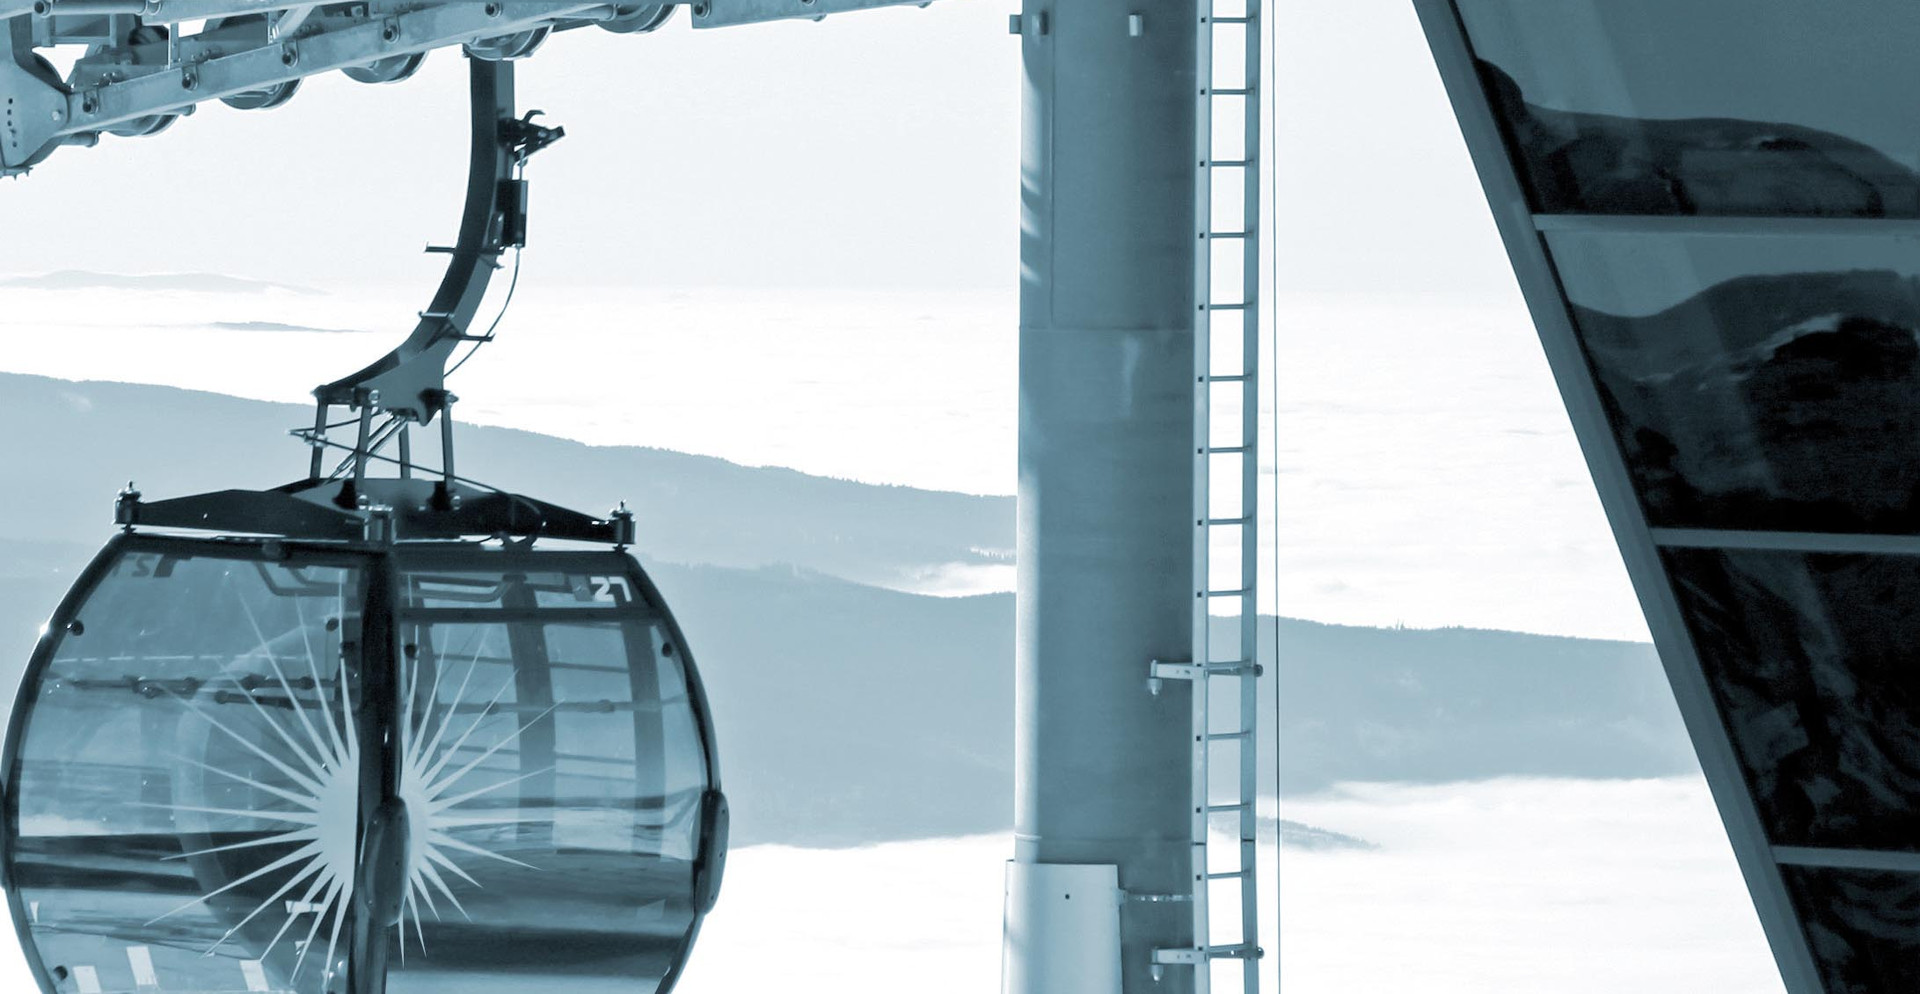 Lift- und Seilbahnbau